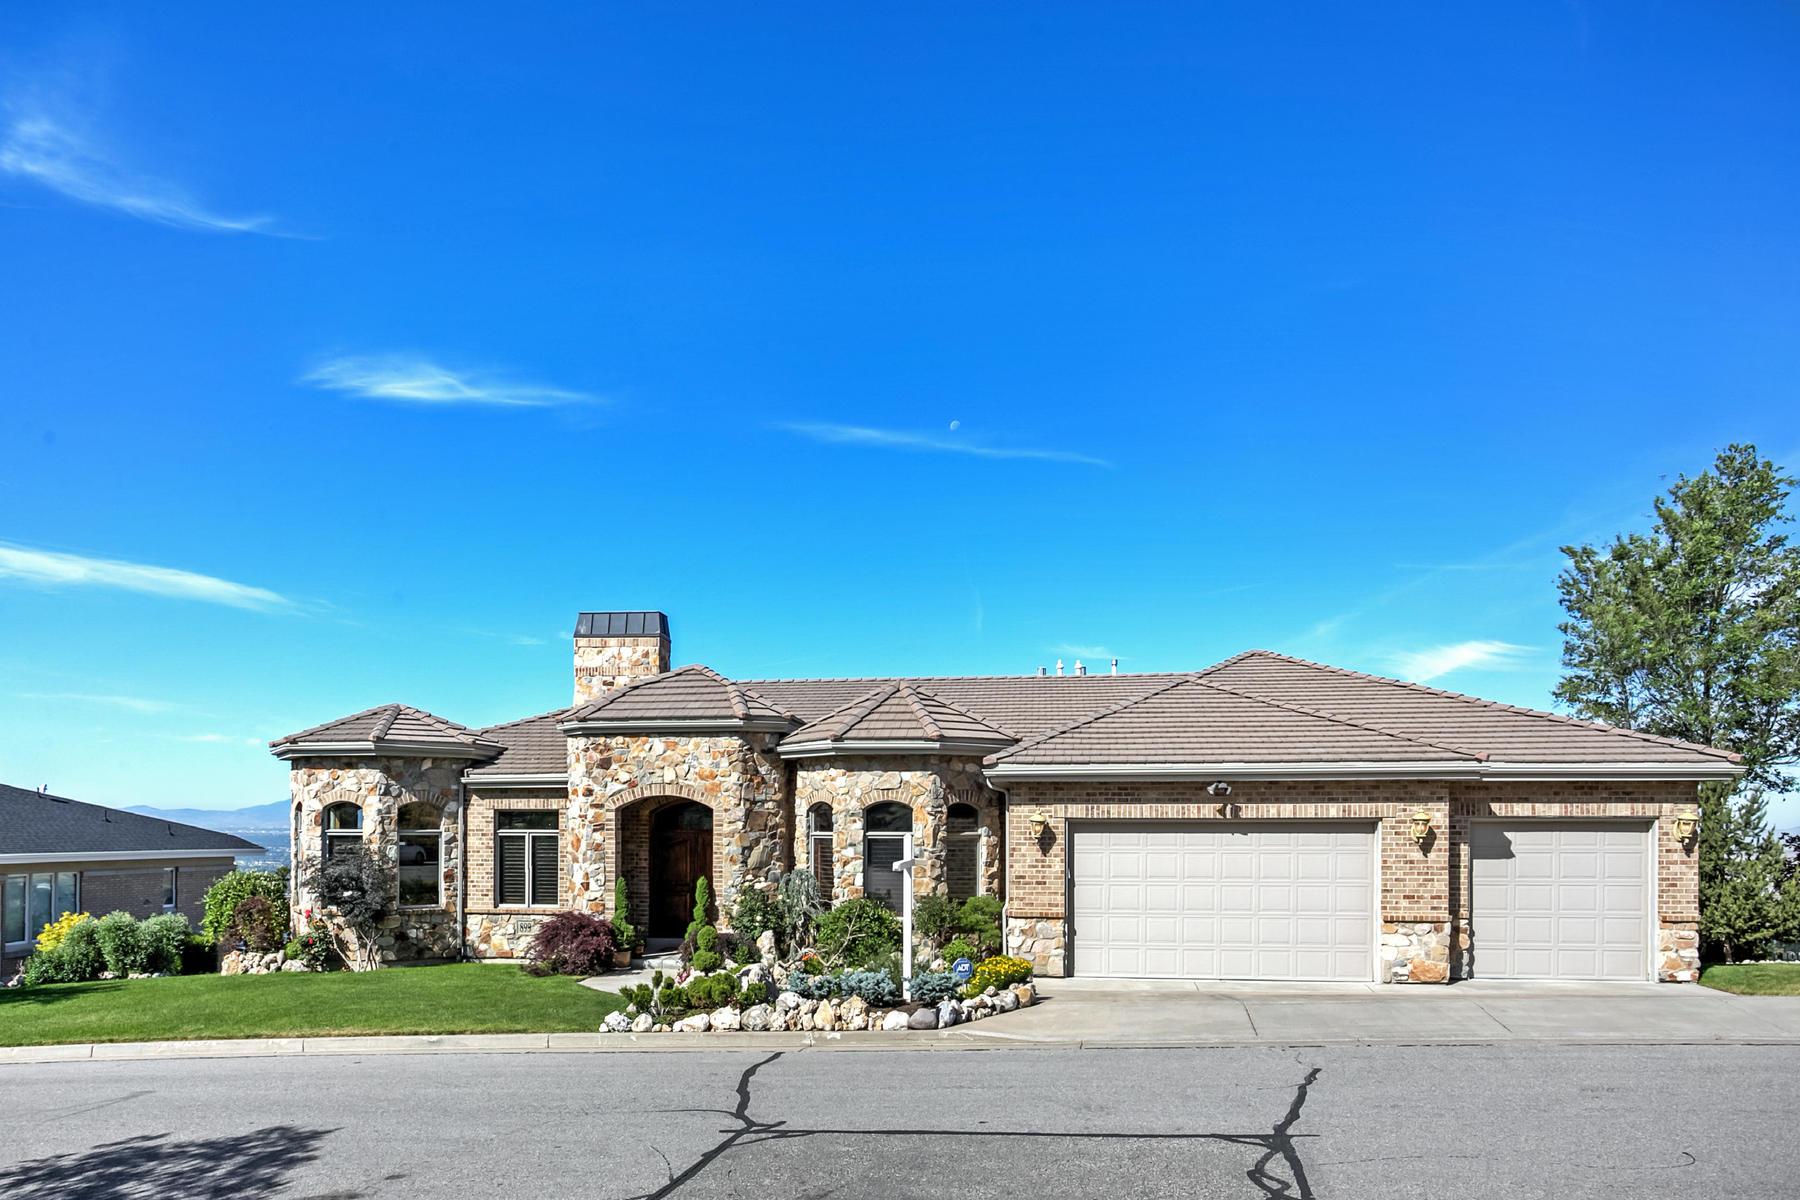 Villa per Vendita alle ore Custom Designed Home with Sweeping Views 899 N Sandhurst Dr Salt Lake City, Utah, 84103 Stati Uniti